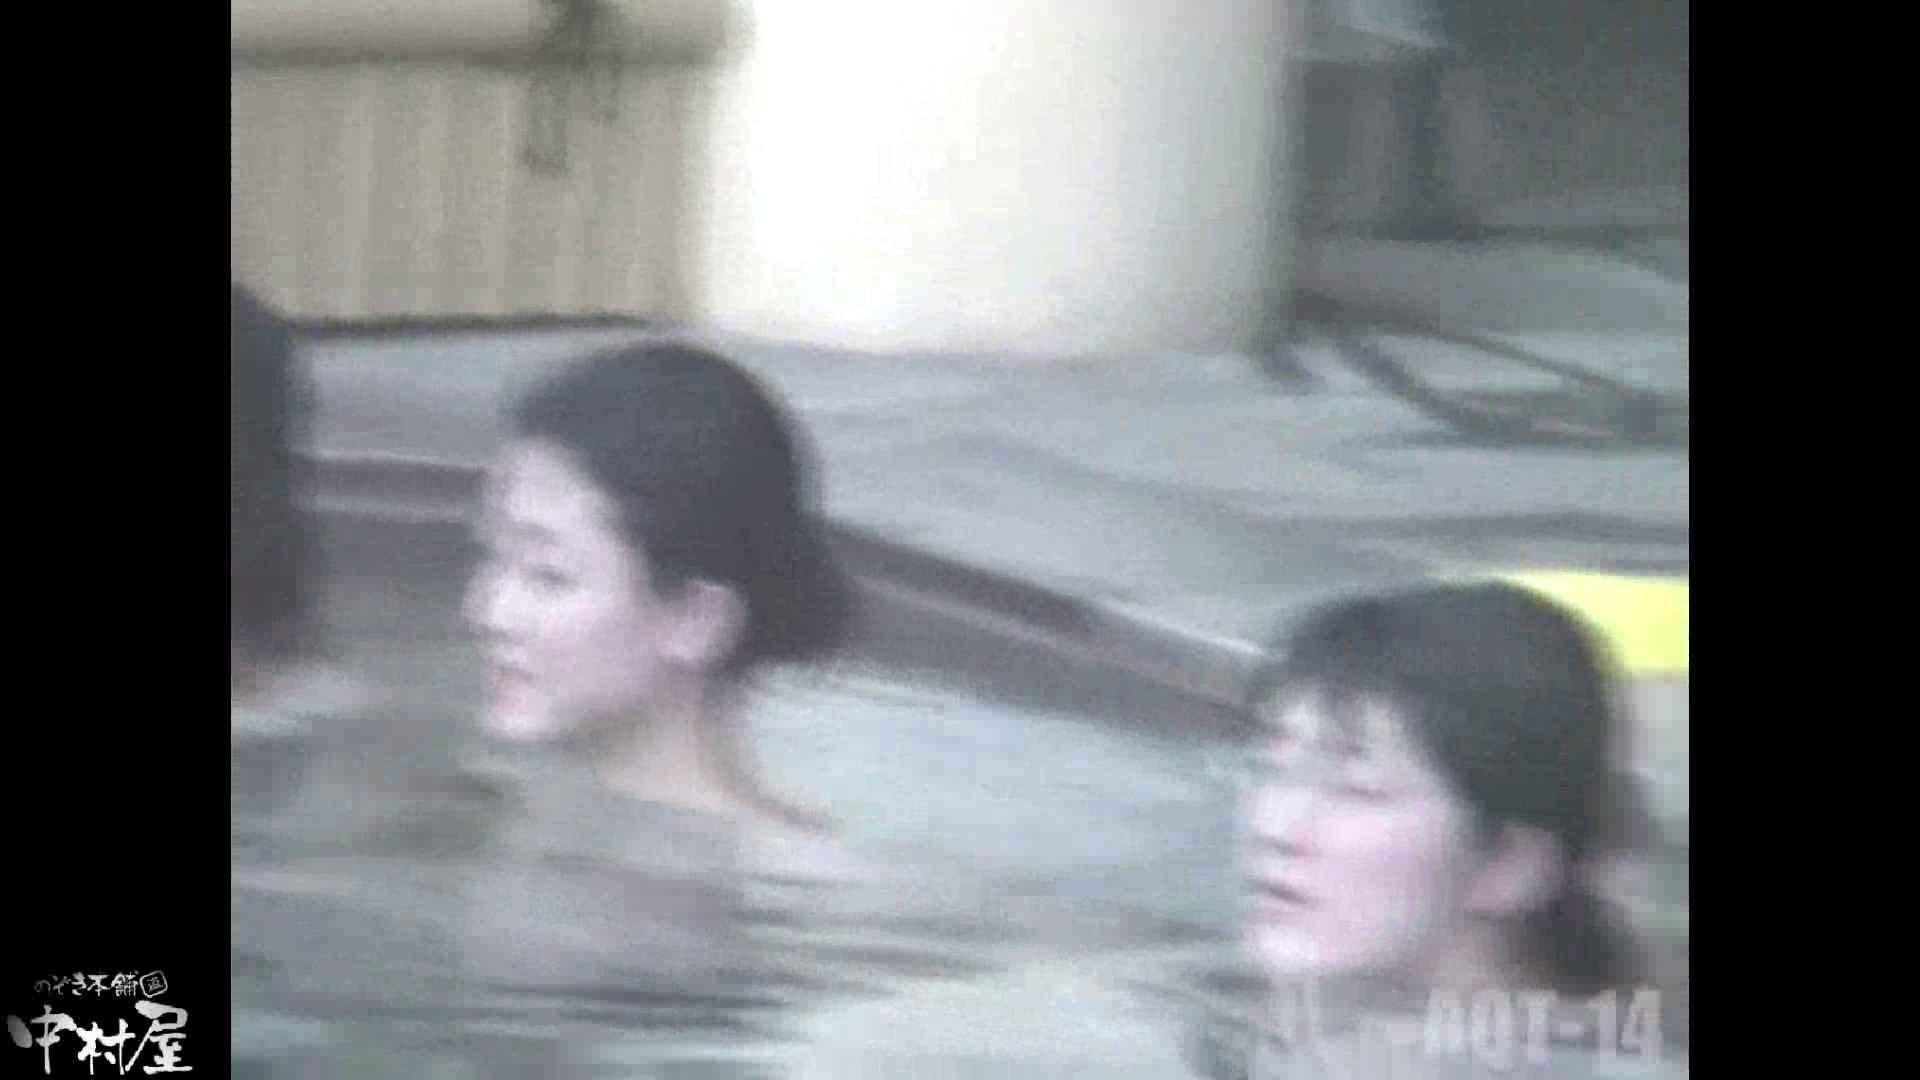 Aquaな露天風呂Vol.878潜入盗撮露天風呂十四判湯 其の十 潜入  92PIX 18